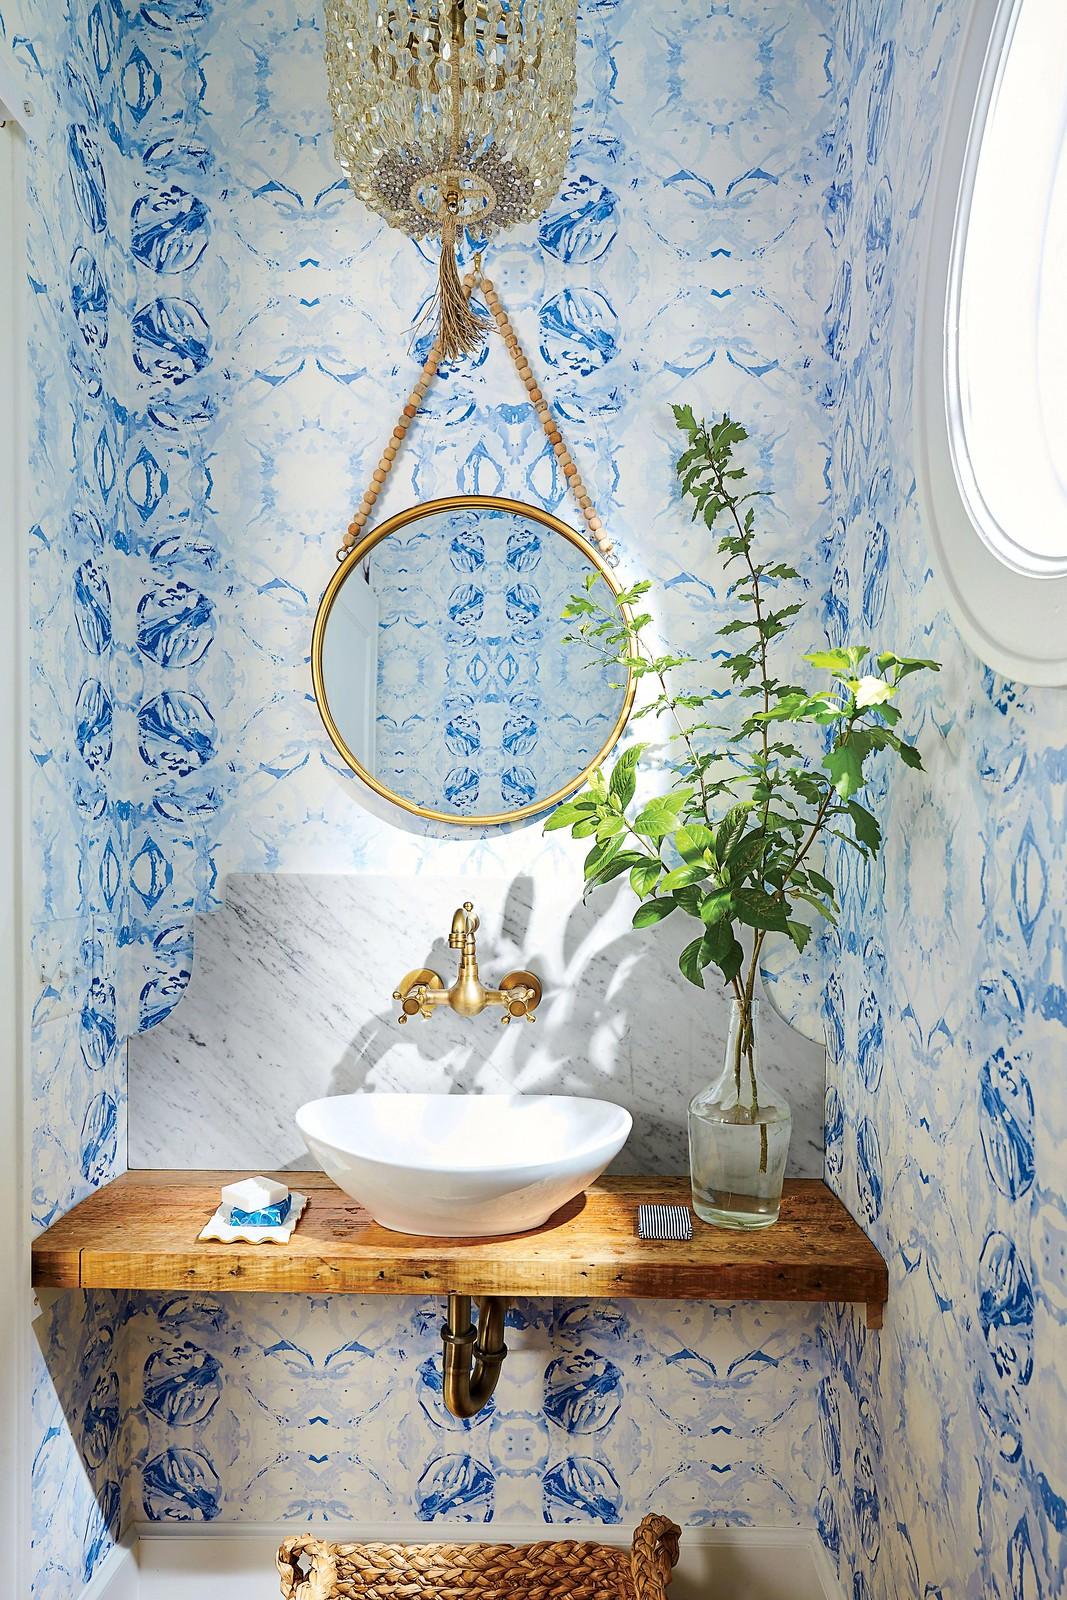 Abstract Blue Wallpapered Bathroom | Beachy Boho Bathroom Inspiration | Eclectic Colorful Bathroom | Blue Powder Room Ideas